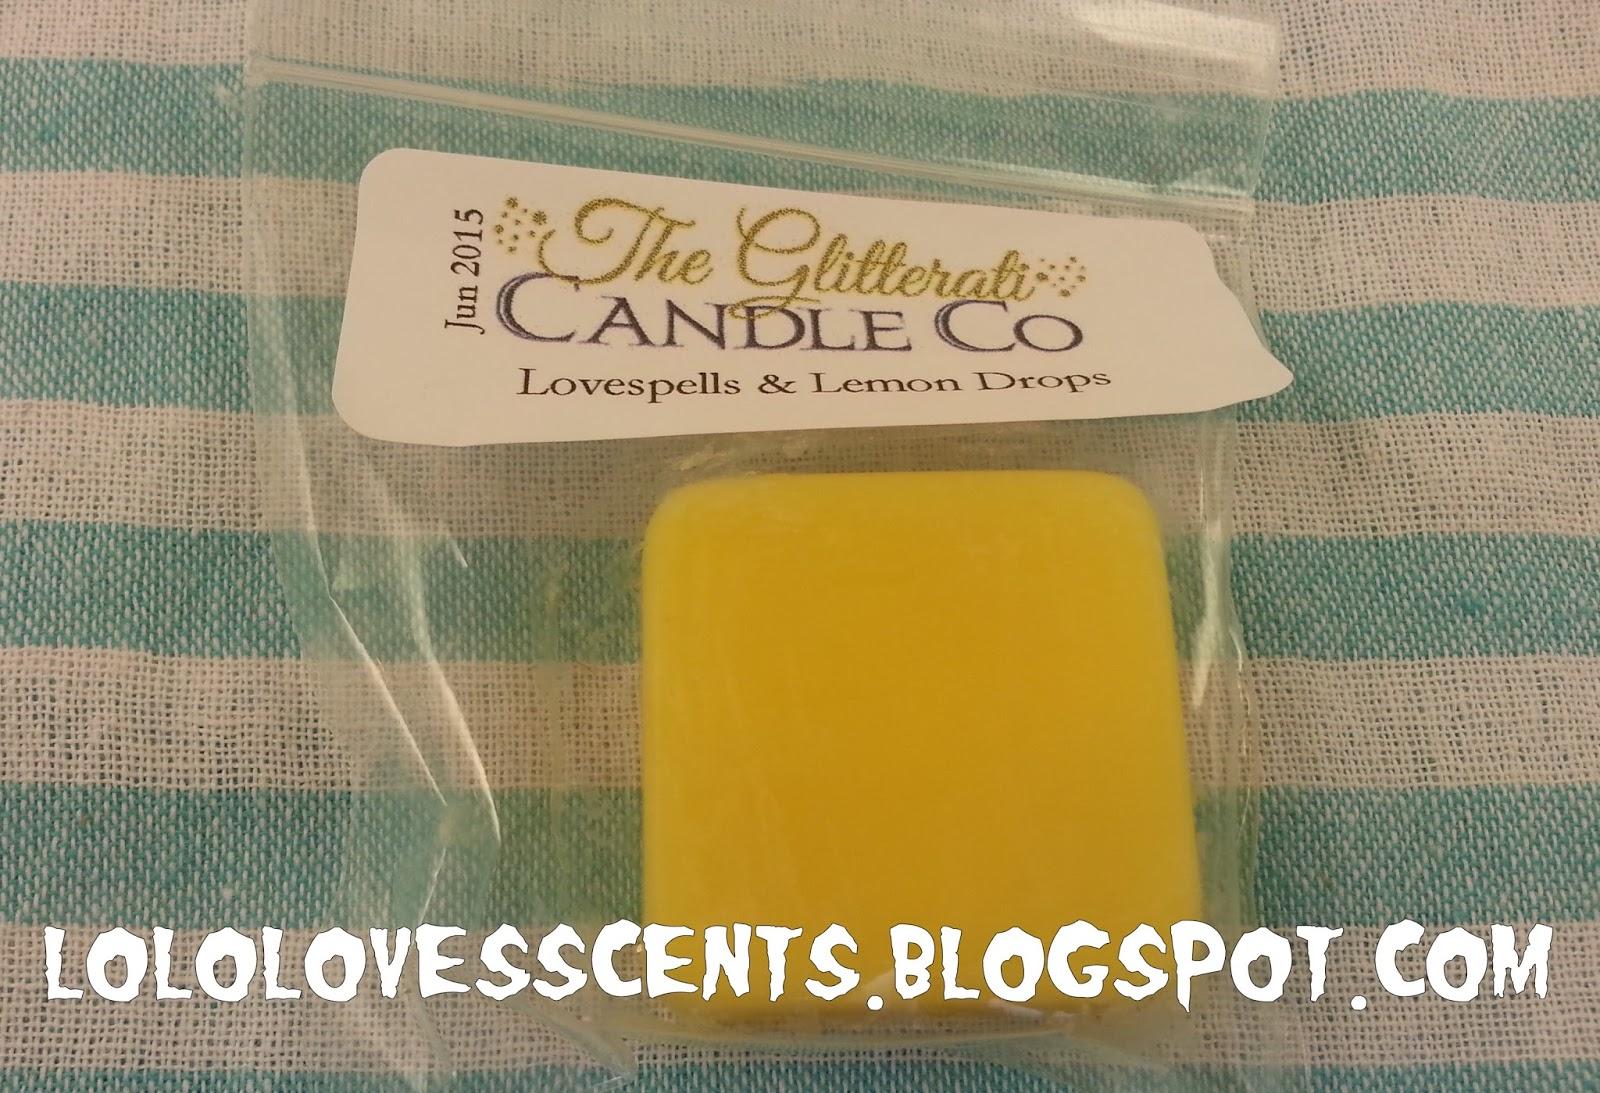 Lolo Loves Scents: Haul: Glitterati Candle Company Custom